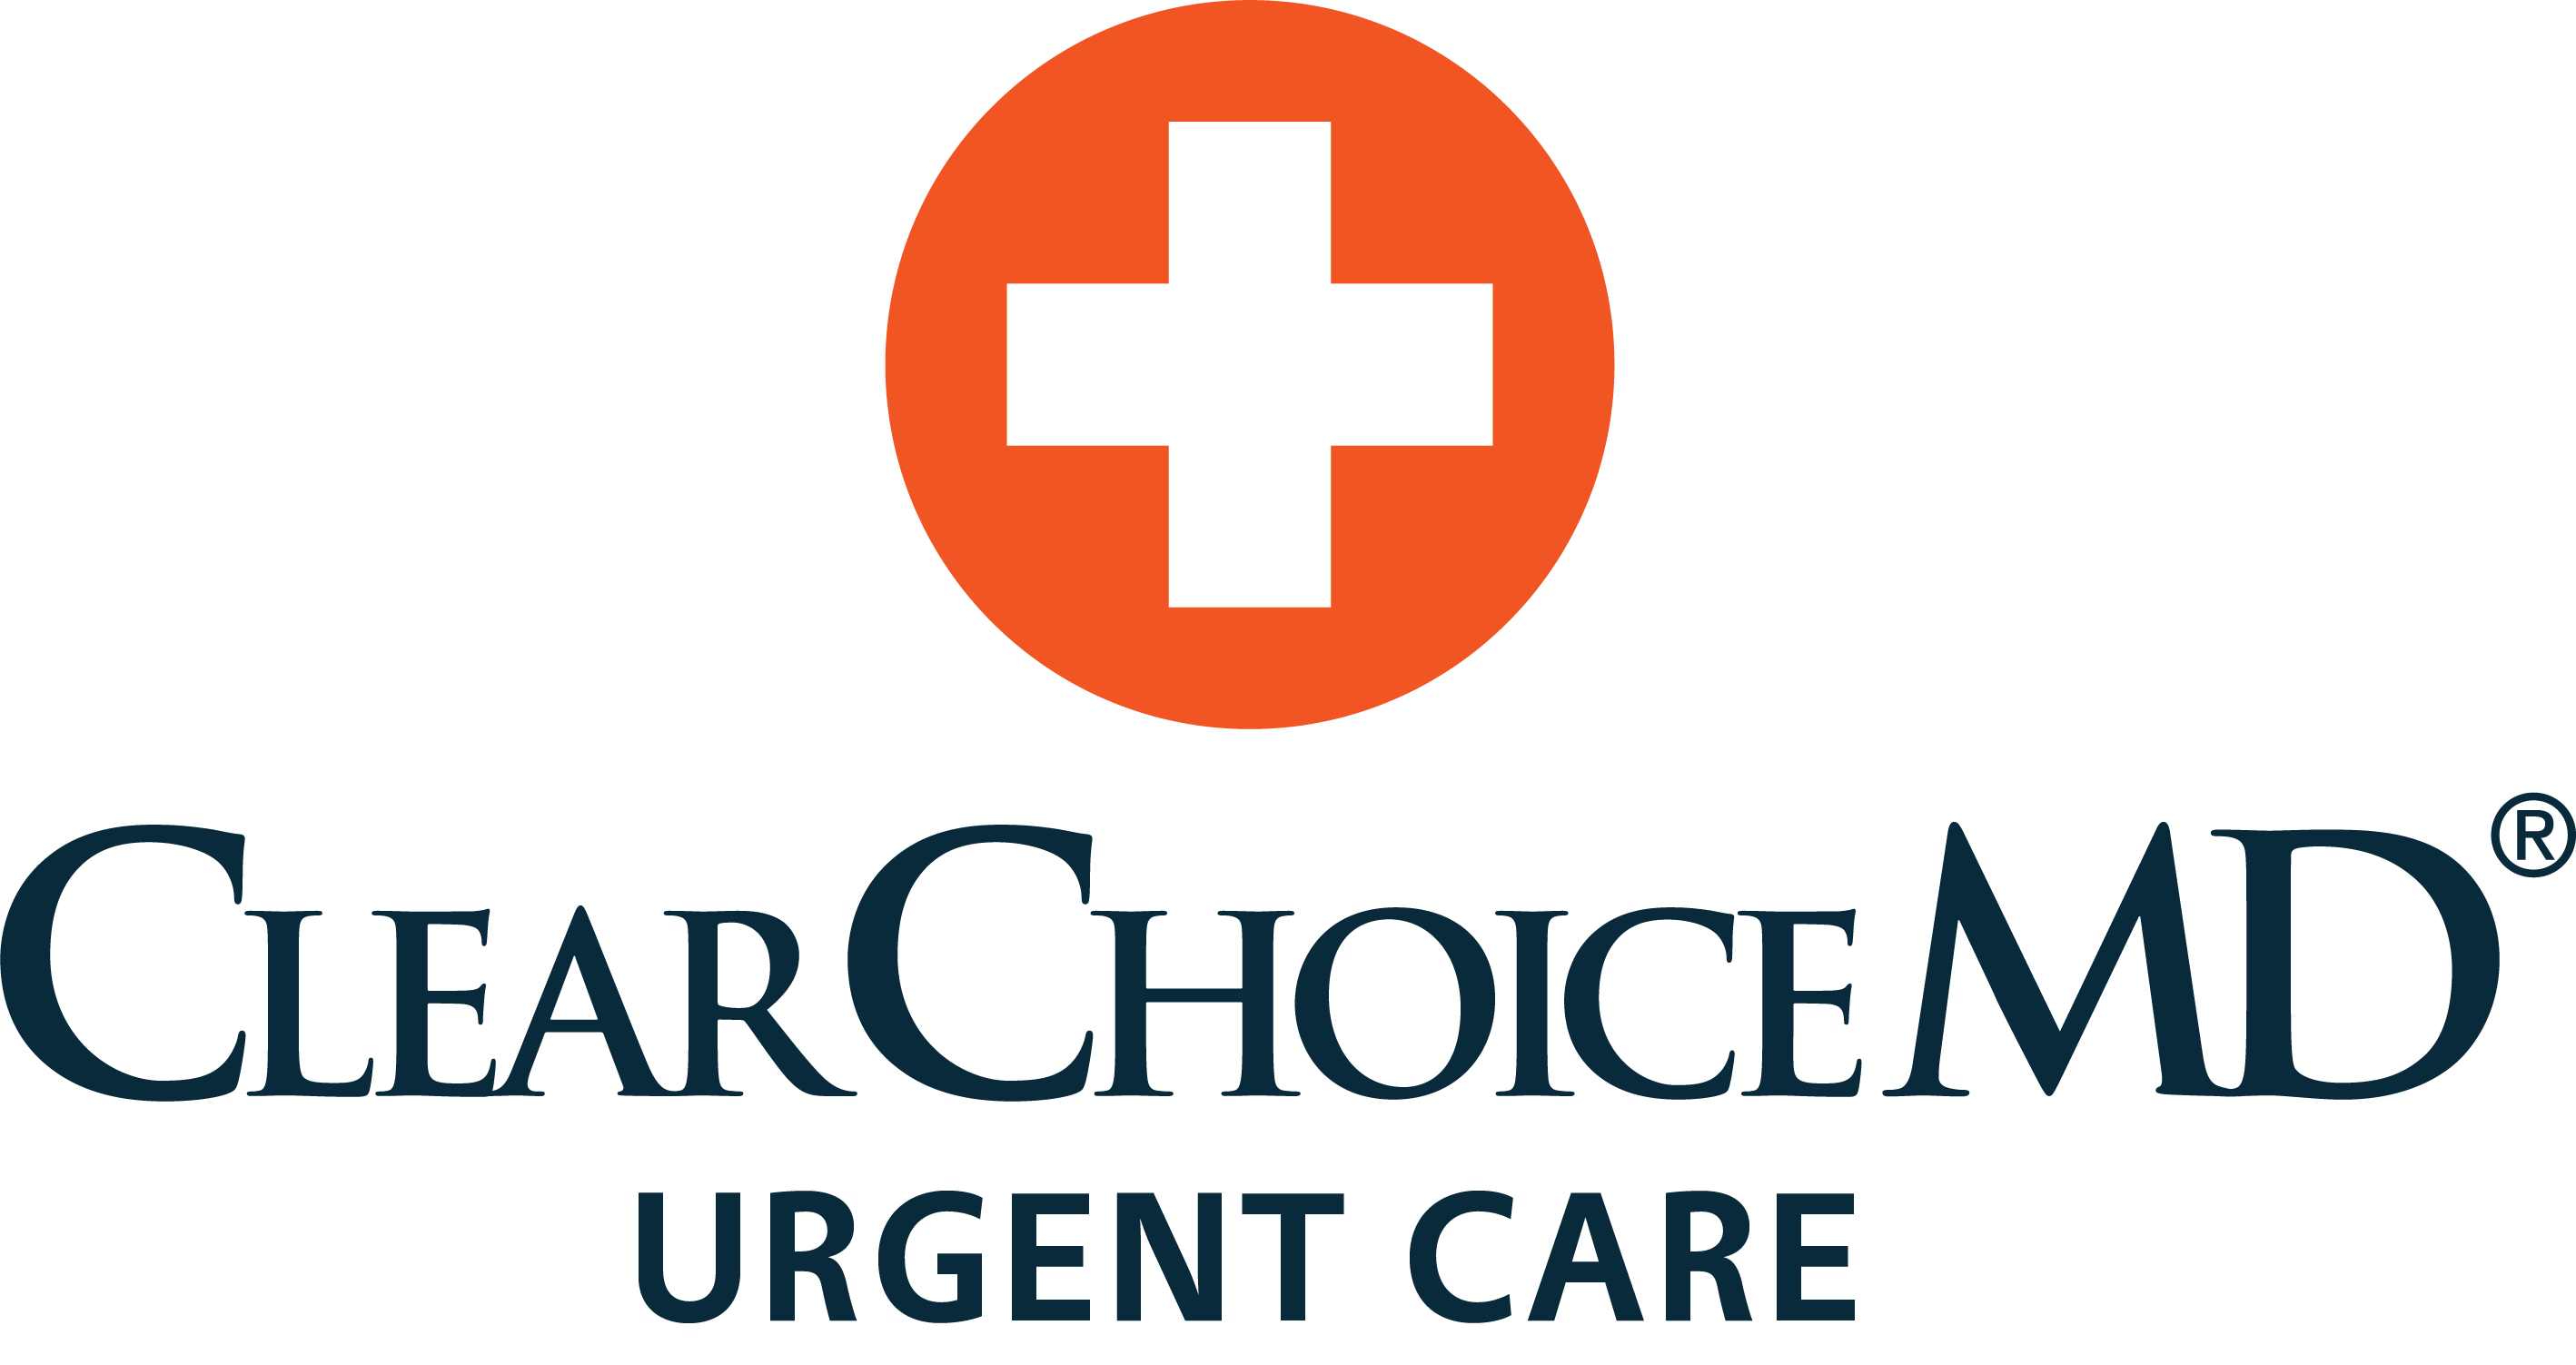 ClearChoiceMD Urgent Care - Alton, NH Logo